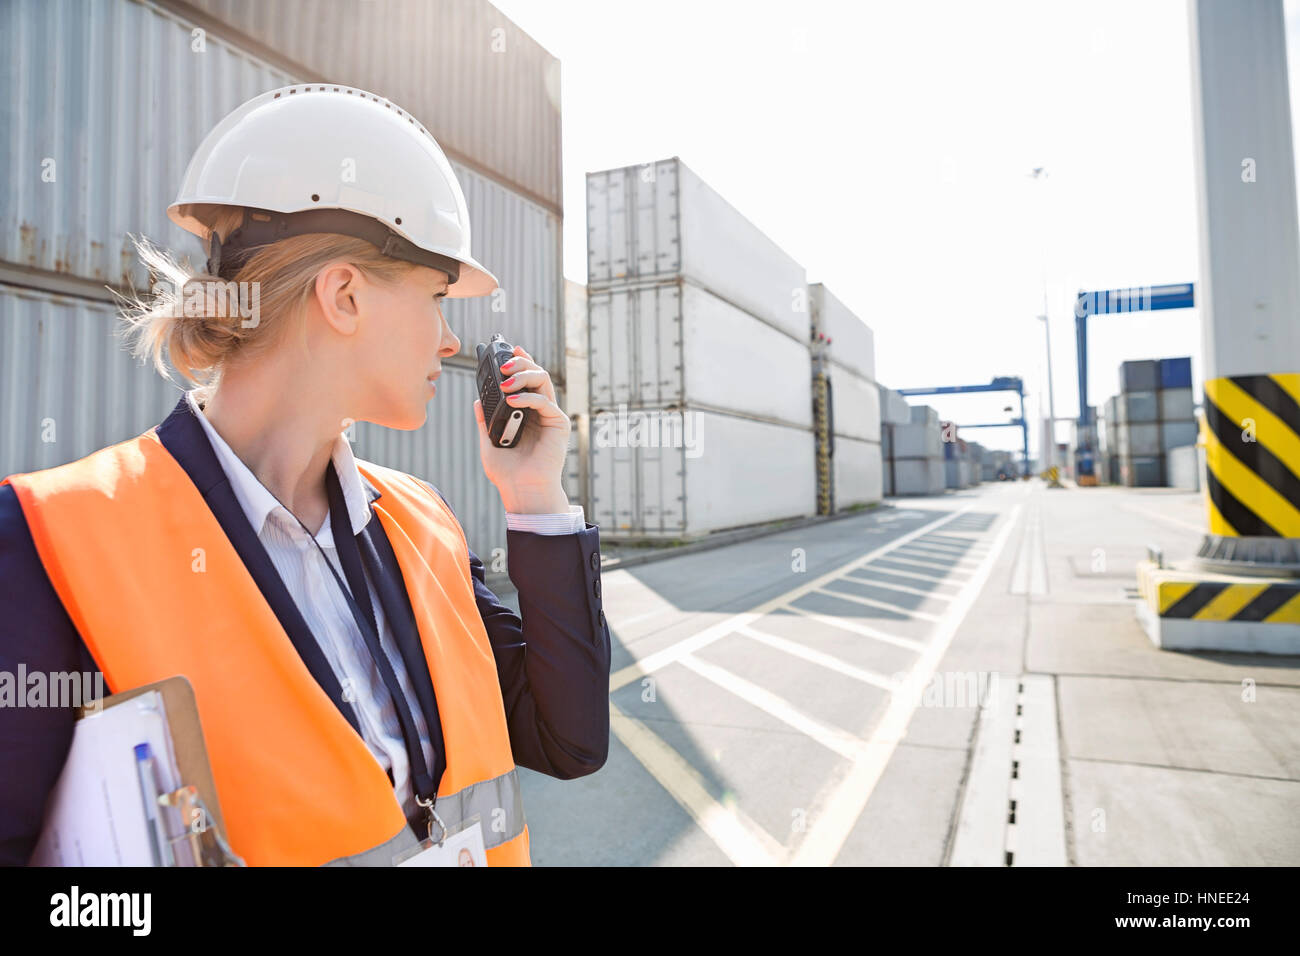 Female engineer using walkie-talkie in shipping yard - Stock Image